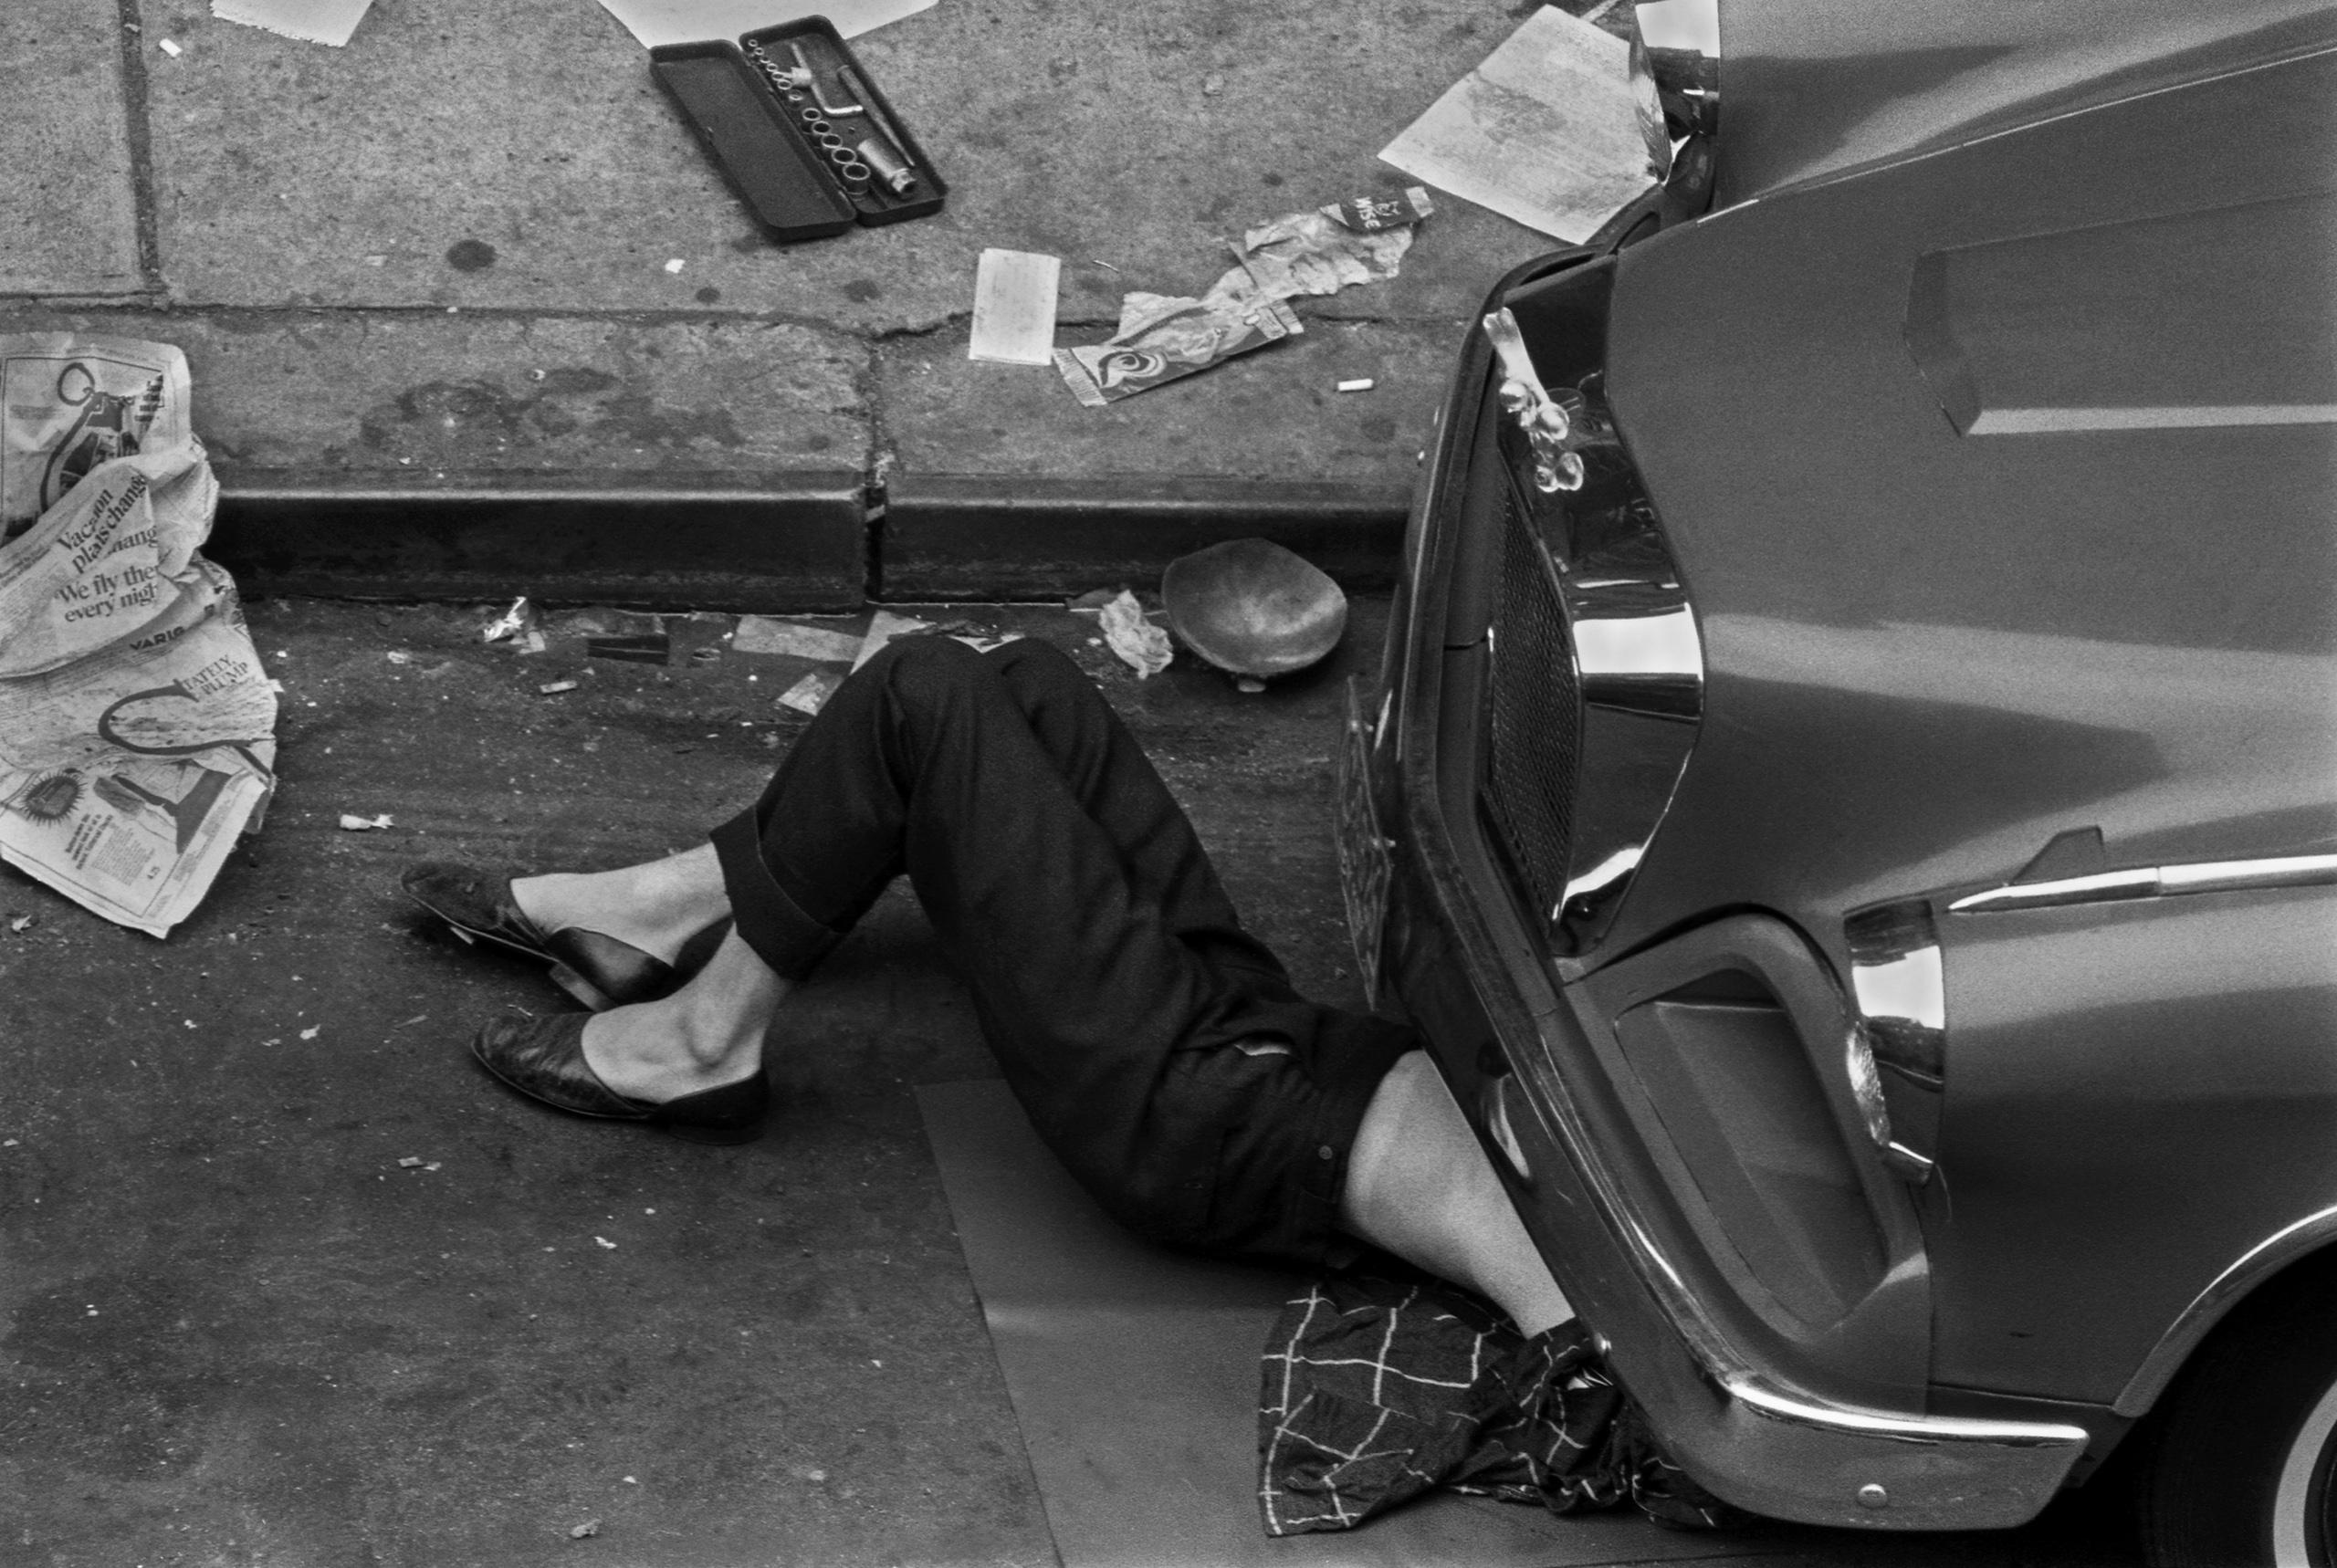 12th Street, 1967.